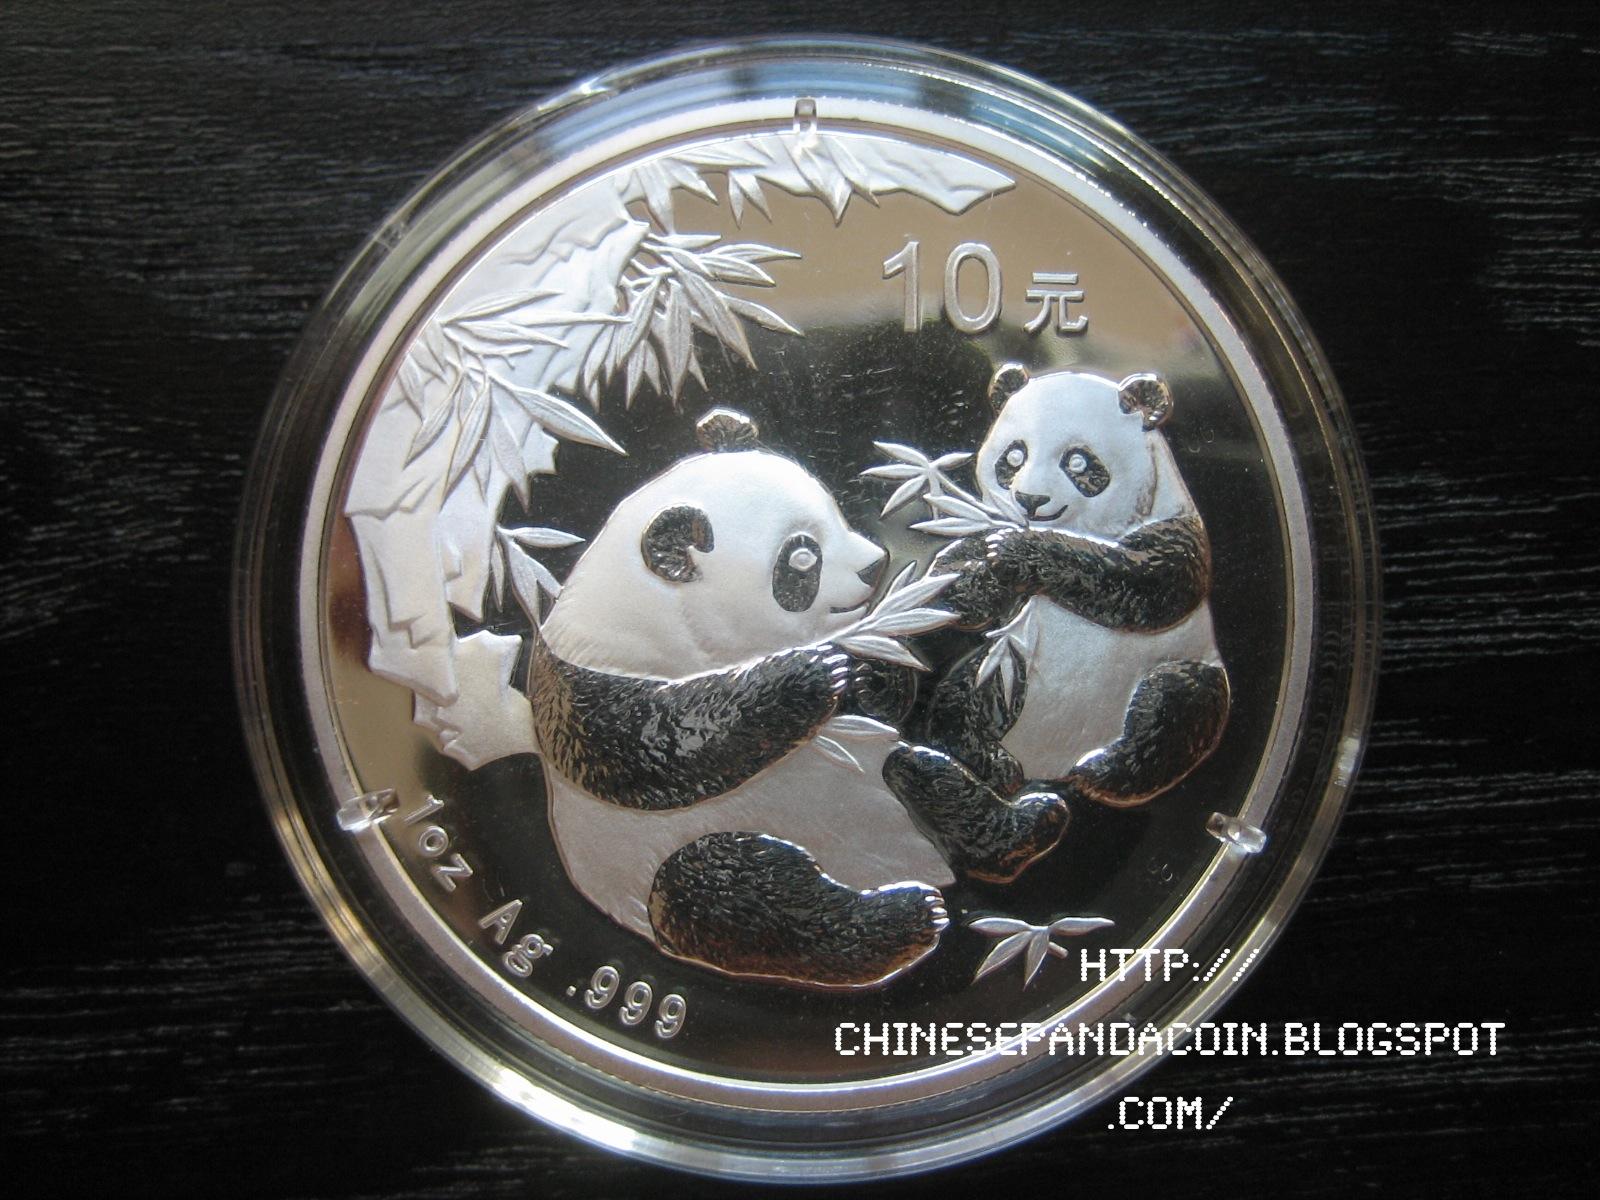 Chinese Panda Coin 2006 Chinese Silver Panda